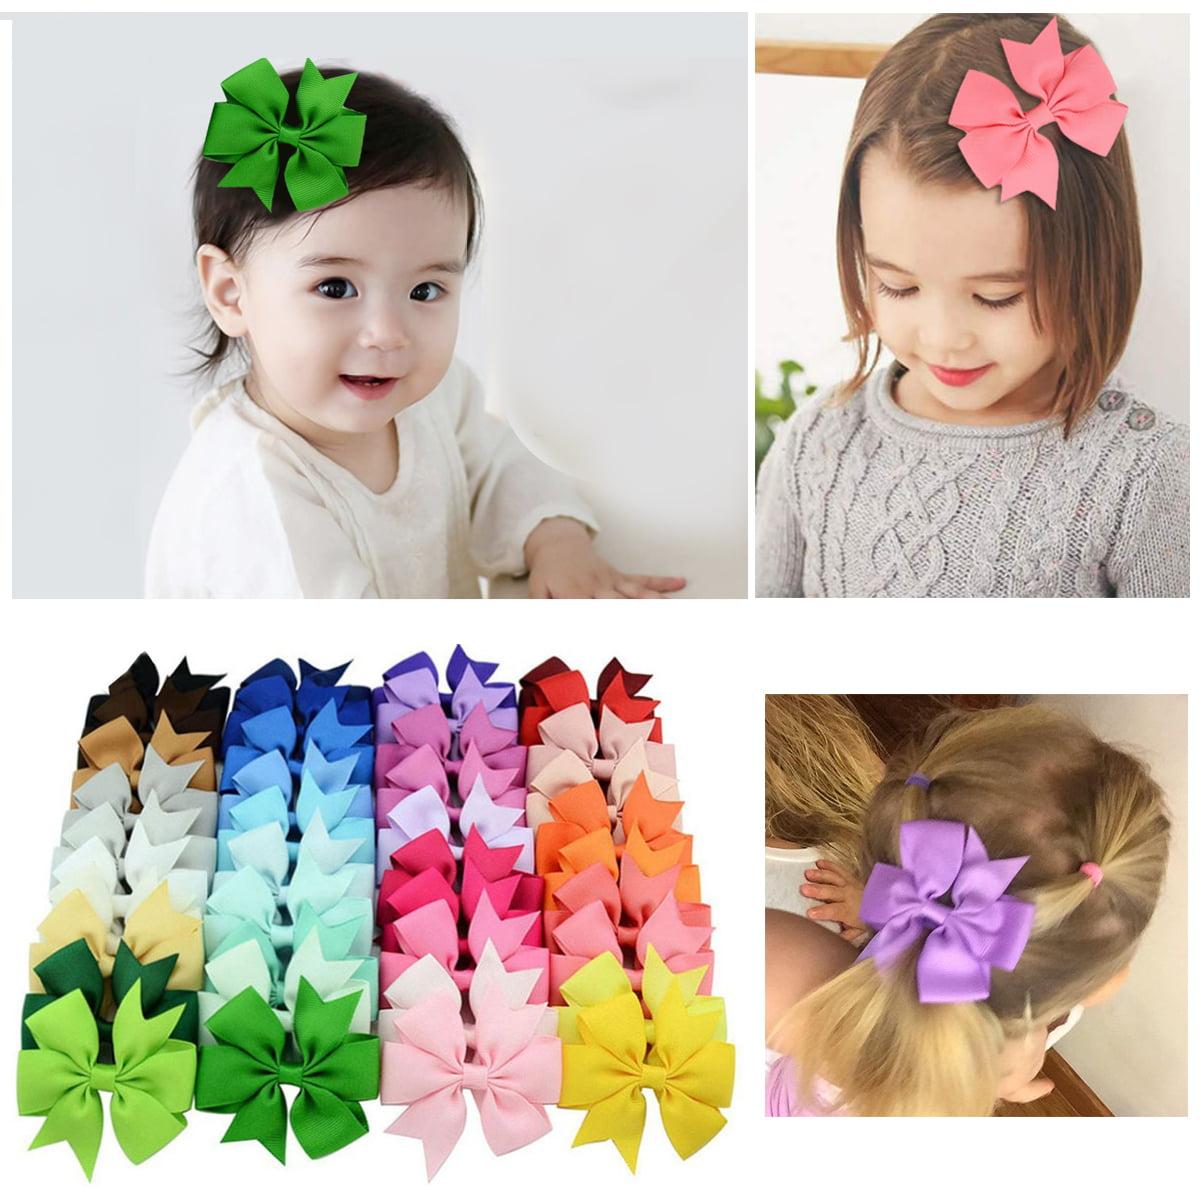 20 Pcs Baby Girls Kids Hair Bow Hairpin Alligator Bowknot Ribbon Clips Grosgrain